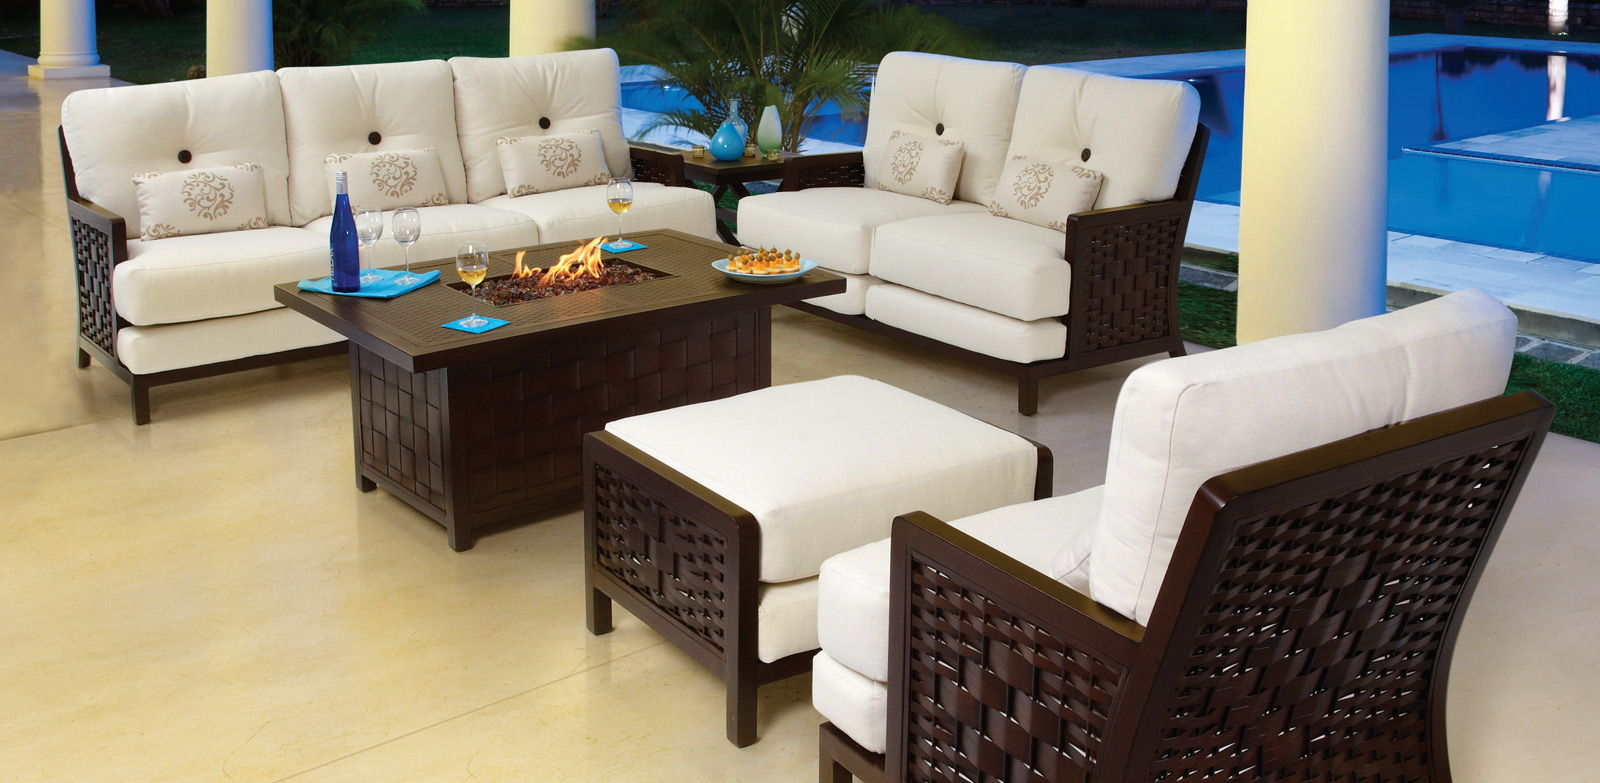 Spanish Bay Collection In Costa Rica Costa Rica Furniture Custom Made Furniture